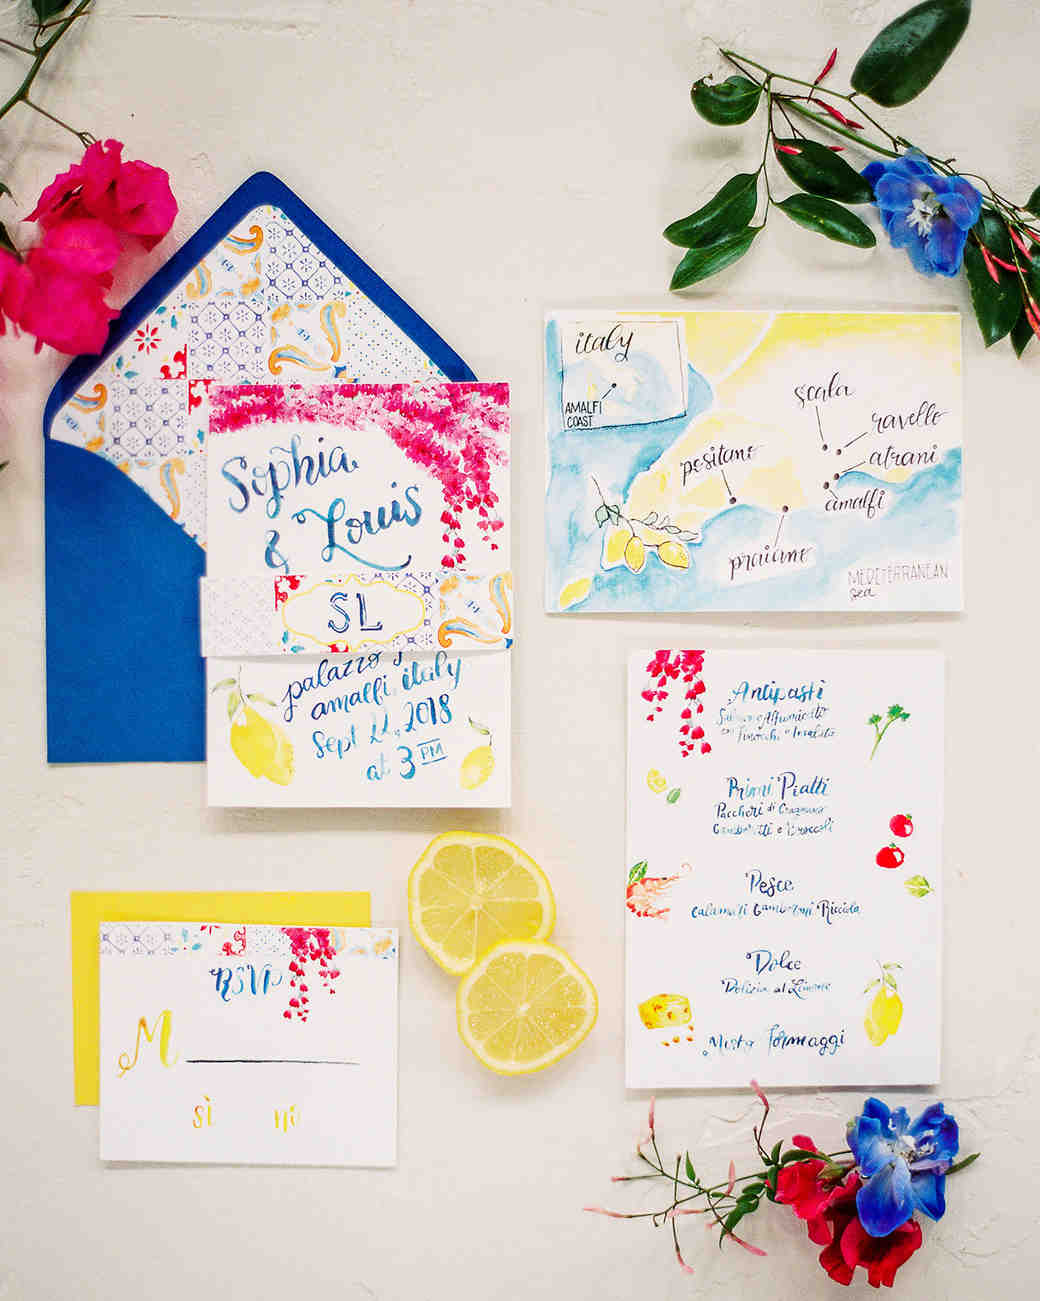 Colorful Wedding Invitation: Spring Bird Themed Wedding Invitations At Reisefeber.org